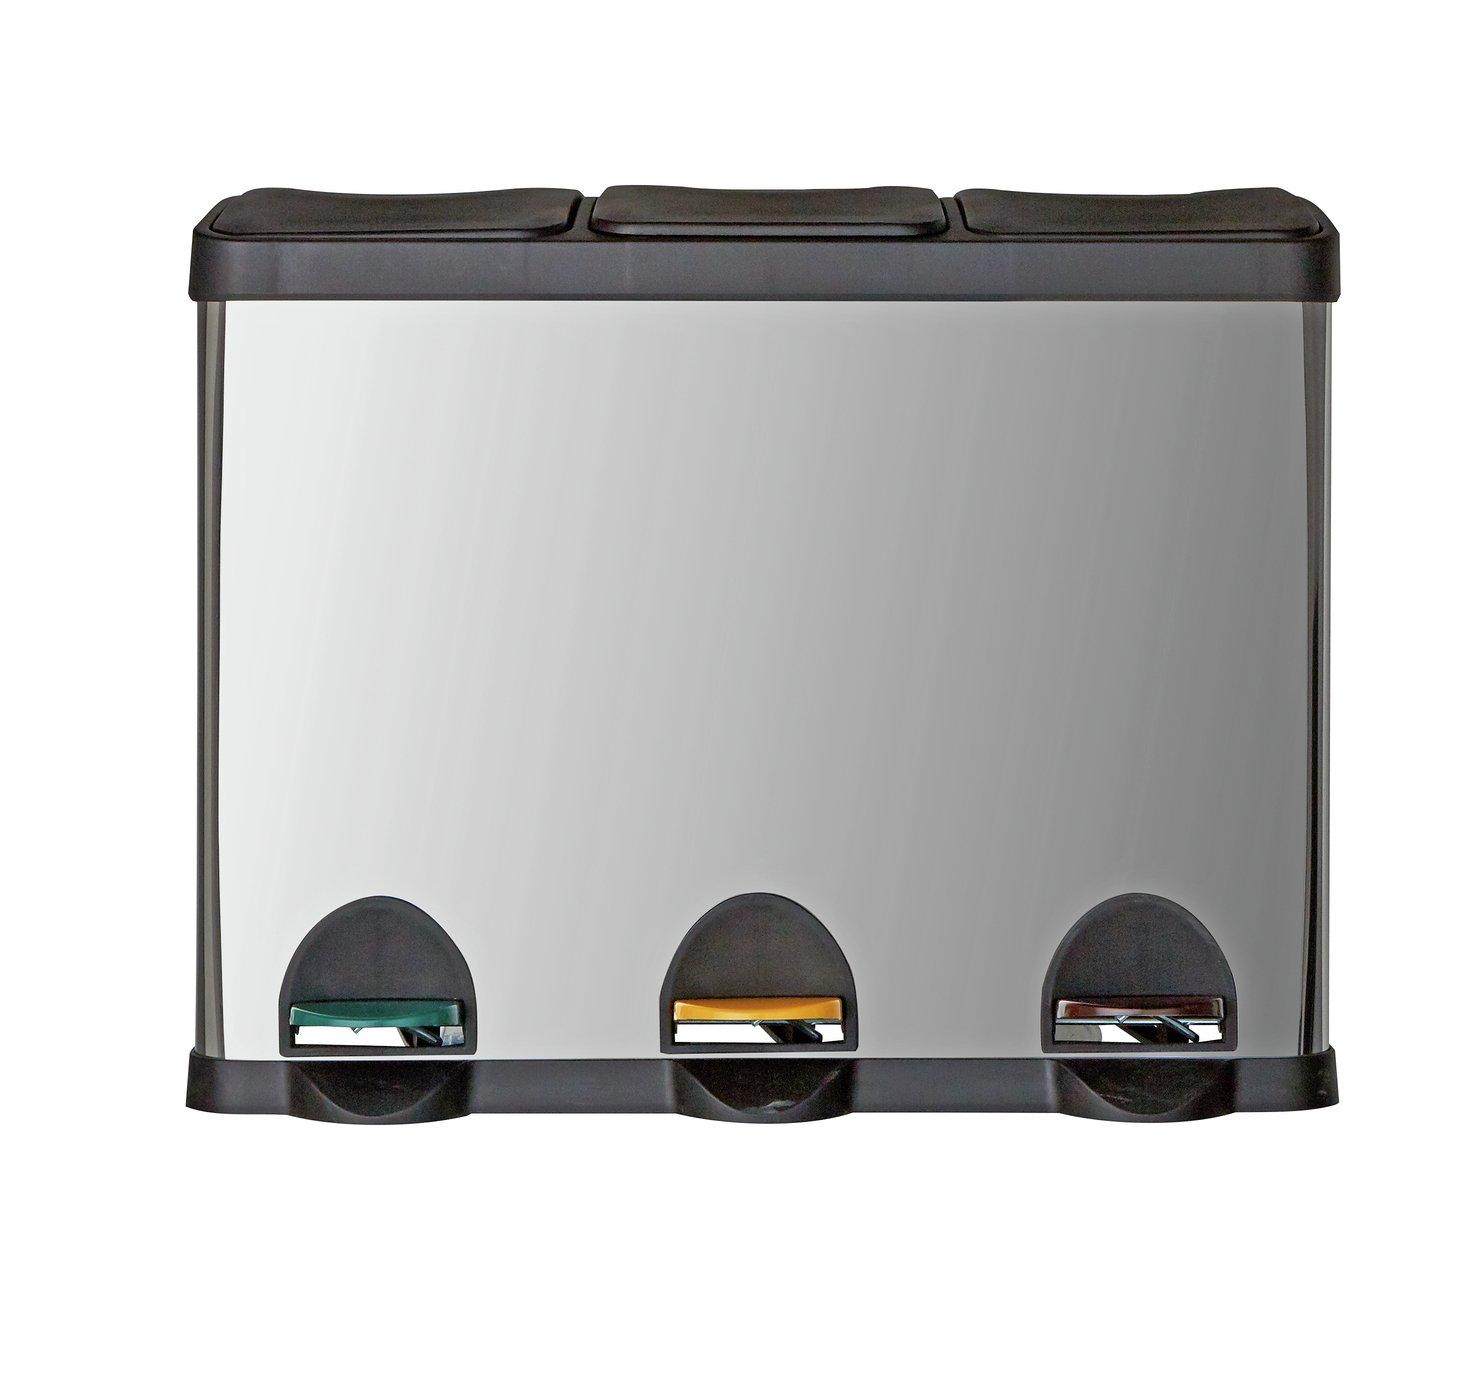 Recycling Bins Kitchen Bins | Argos